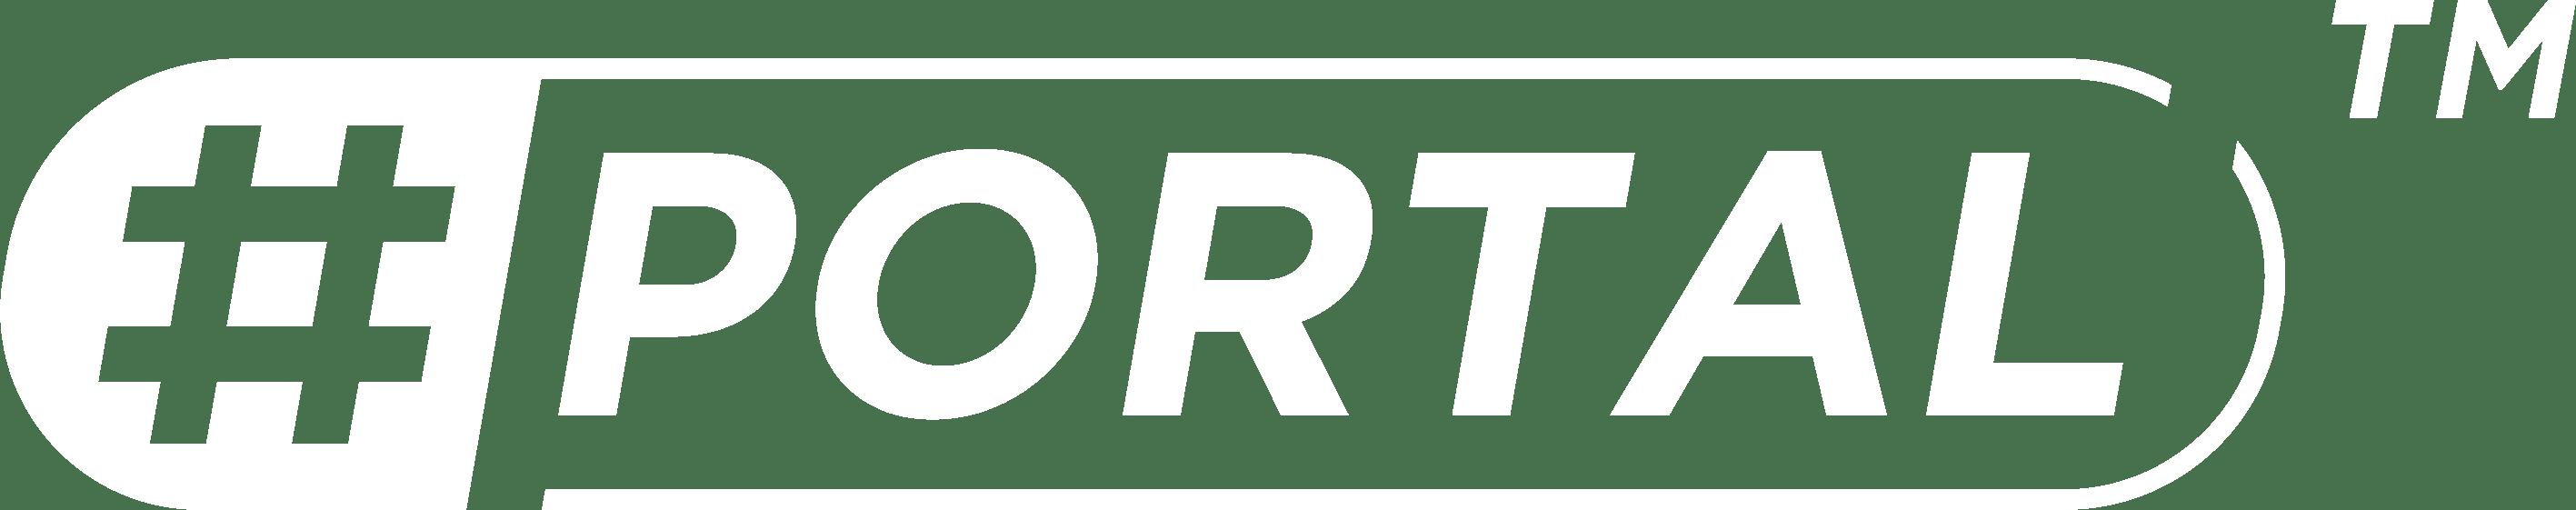 Hashtag Portal